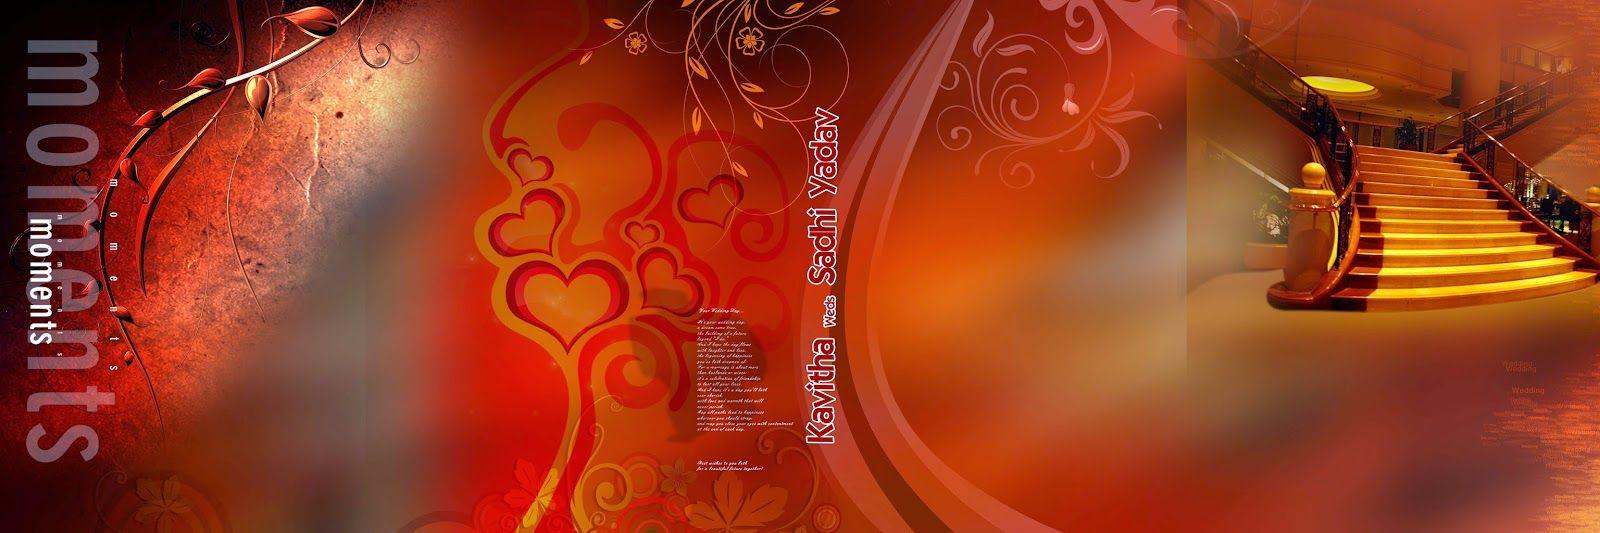 Wwwnaveengfxcom 12x36 Album Psd File Free Download